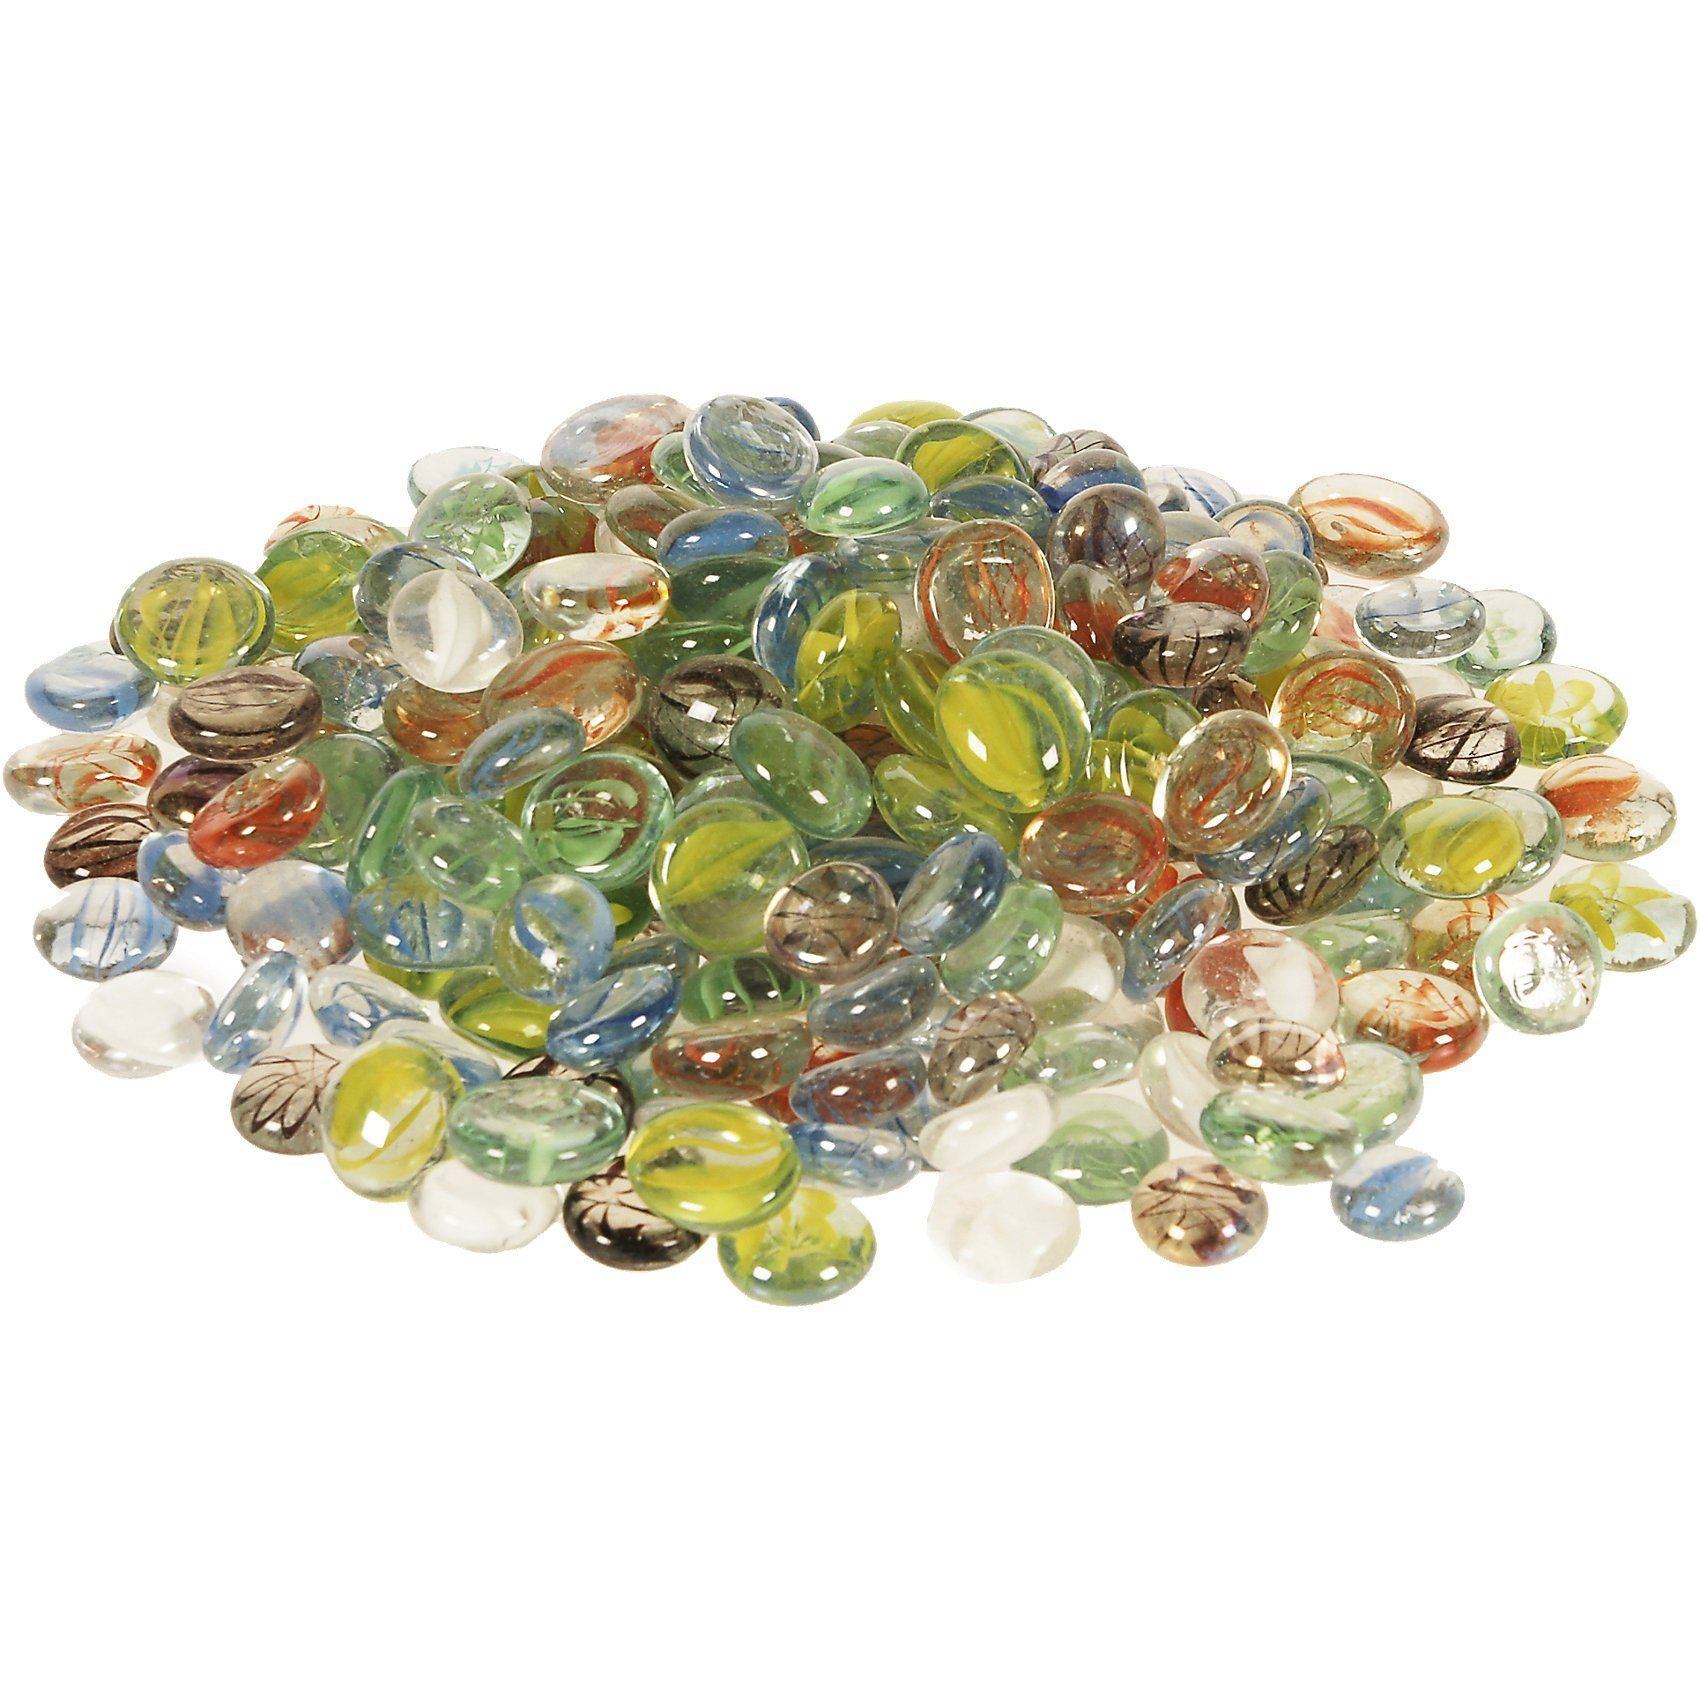 SUNNYSUE Set Glasnuggets marmoriert, 1kg